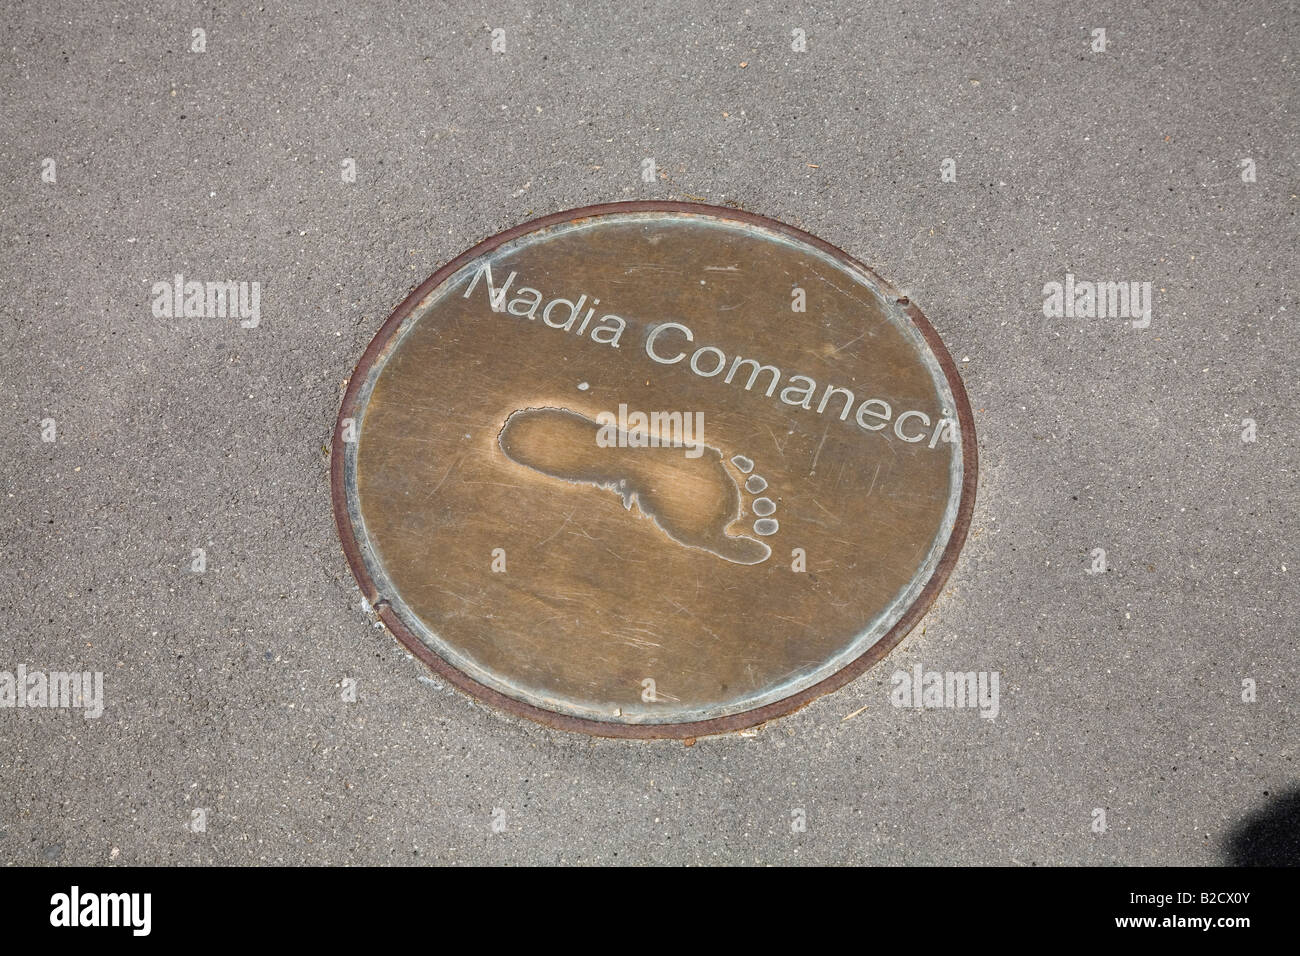 Nadia Comaneci footprints at the Olympic Stadium Barcelona Spain May 2008 - Stock Image